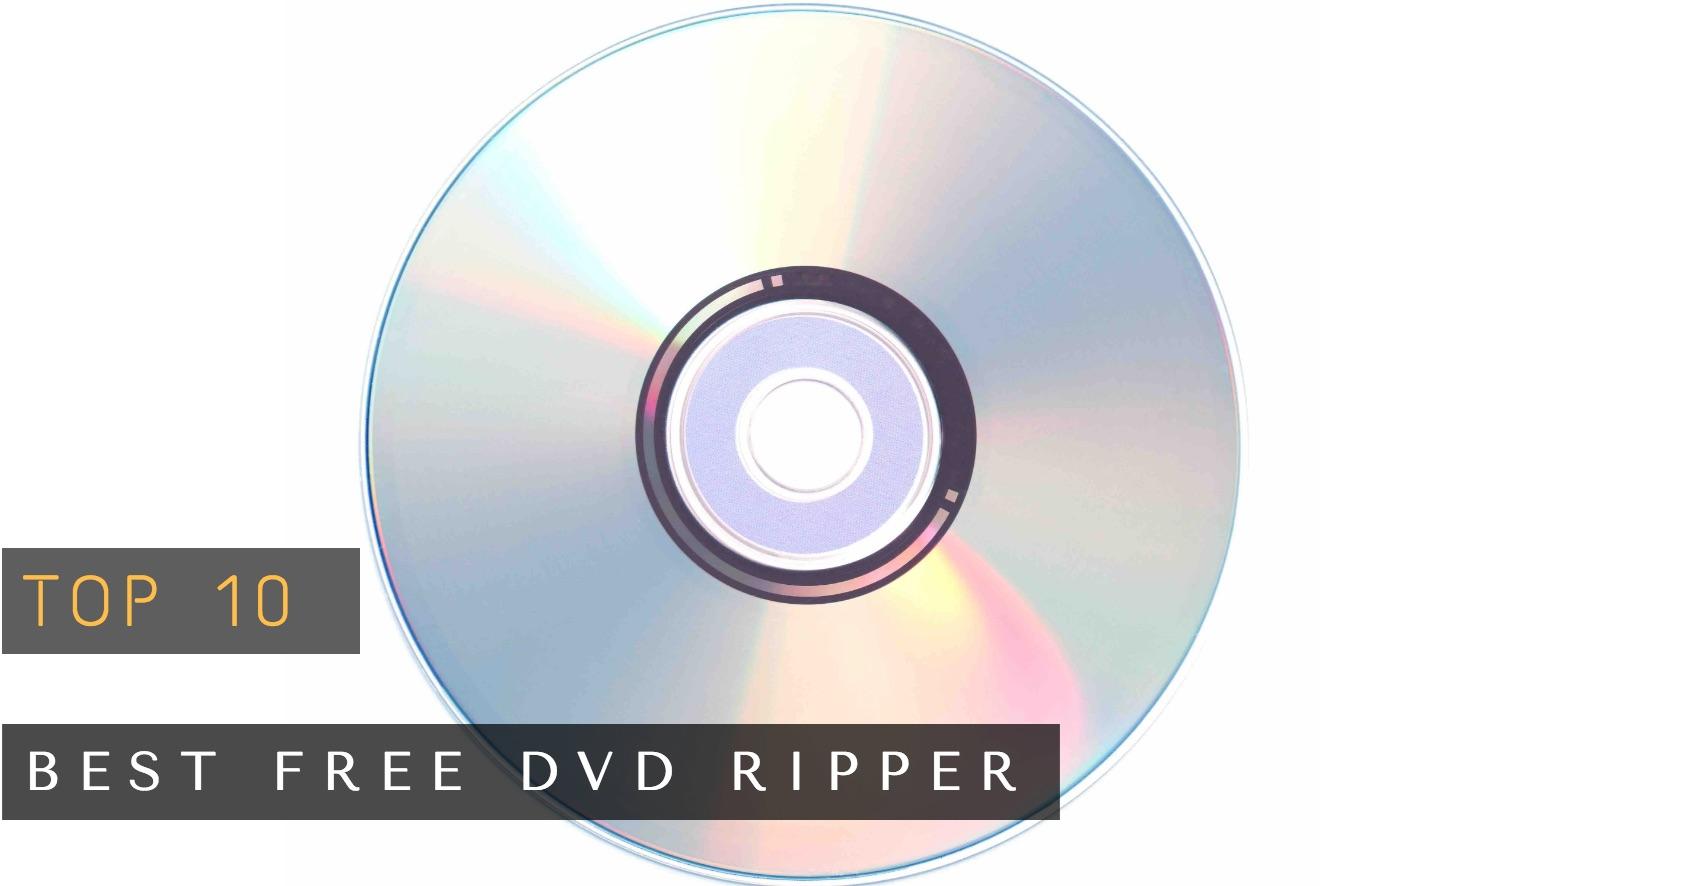 Top 2 Free Dvd Ripper For Mac